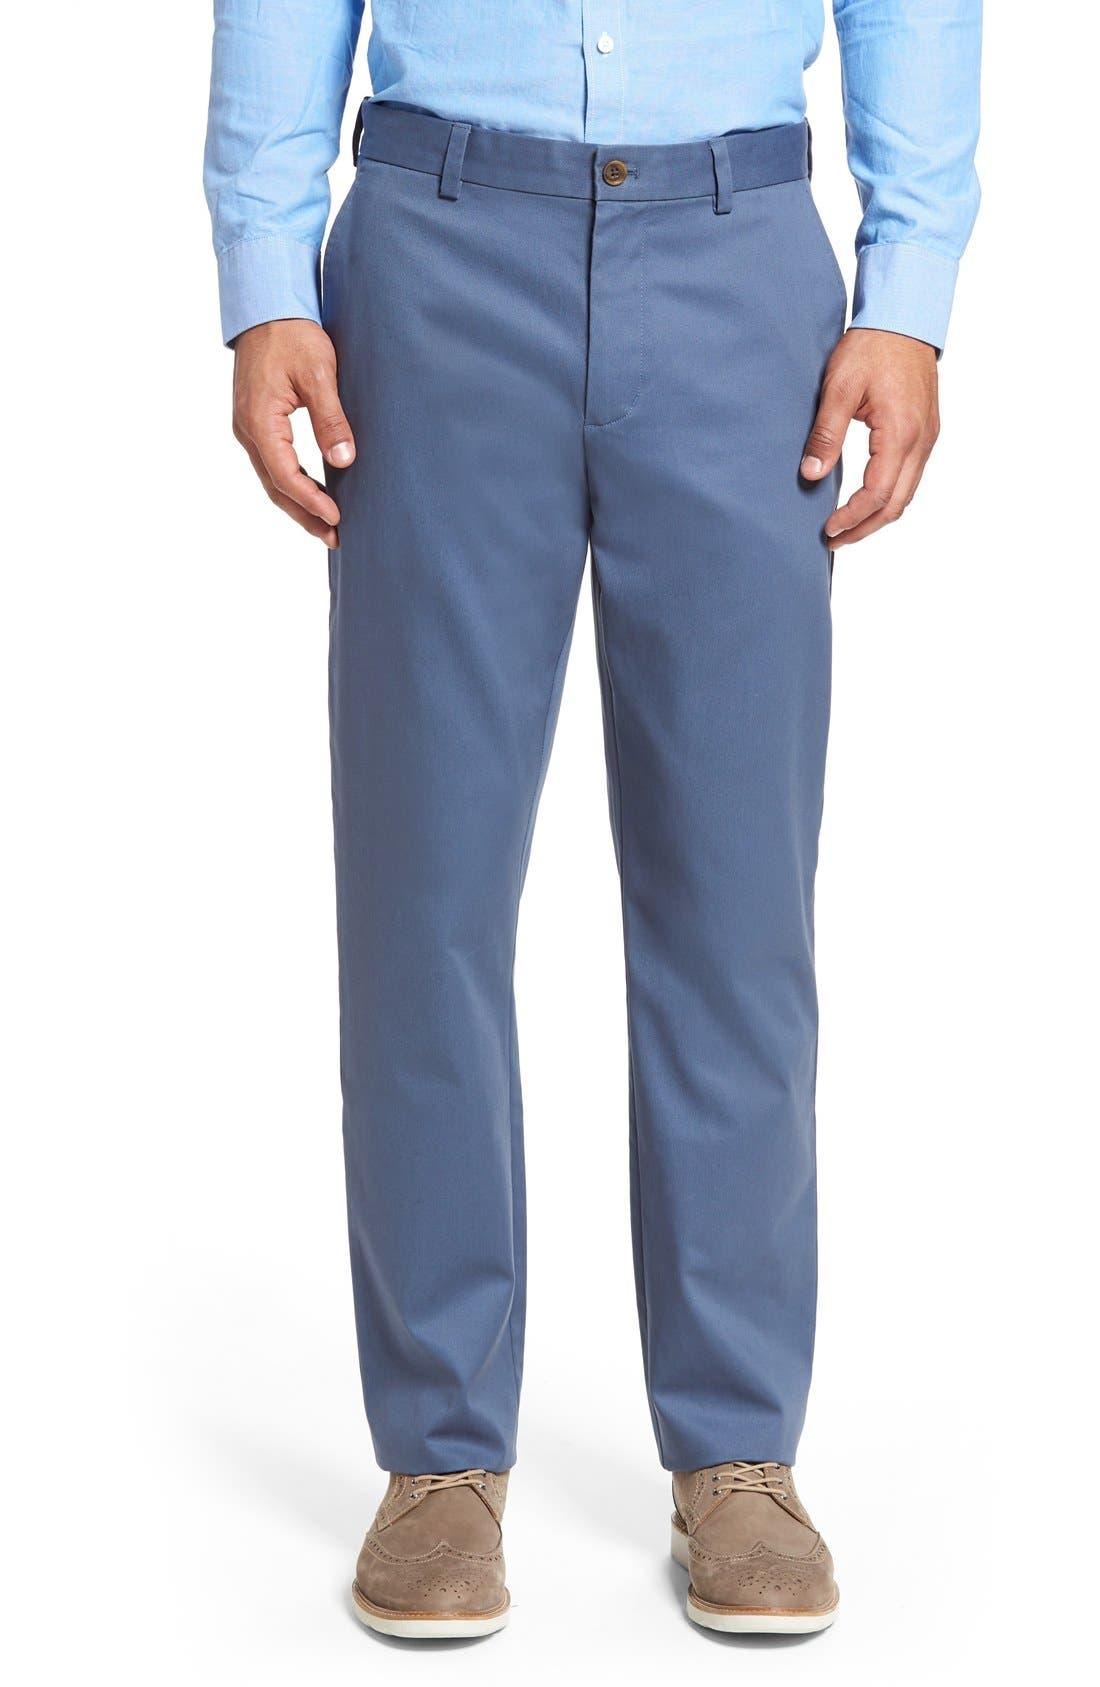 Alternate Image 1 Selected - Nordstrom Men's Shop Wrinkle Free Straight Leg Chinos